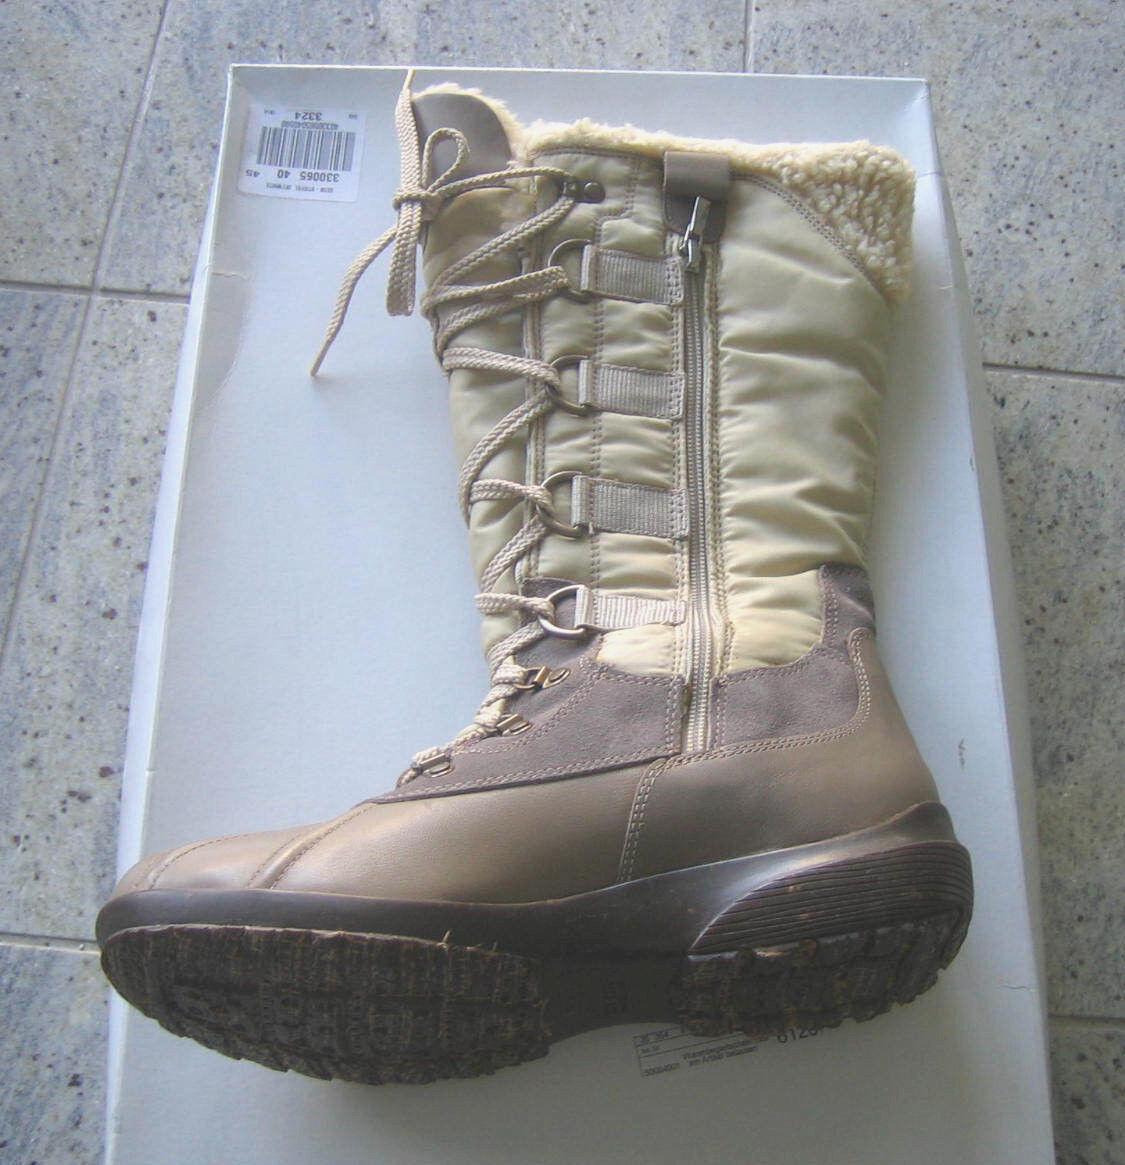 Geox an Stiefel, kalte Füße gehören  der Vergangenheit an Geox ce8d44